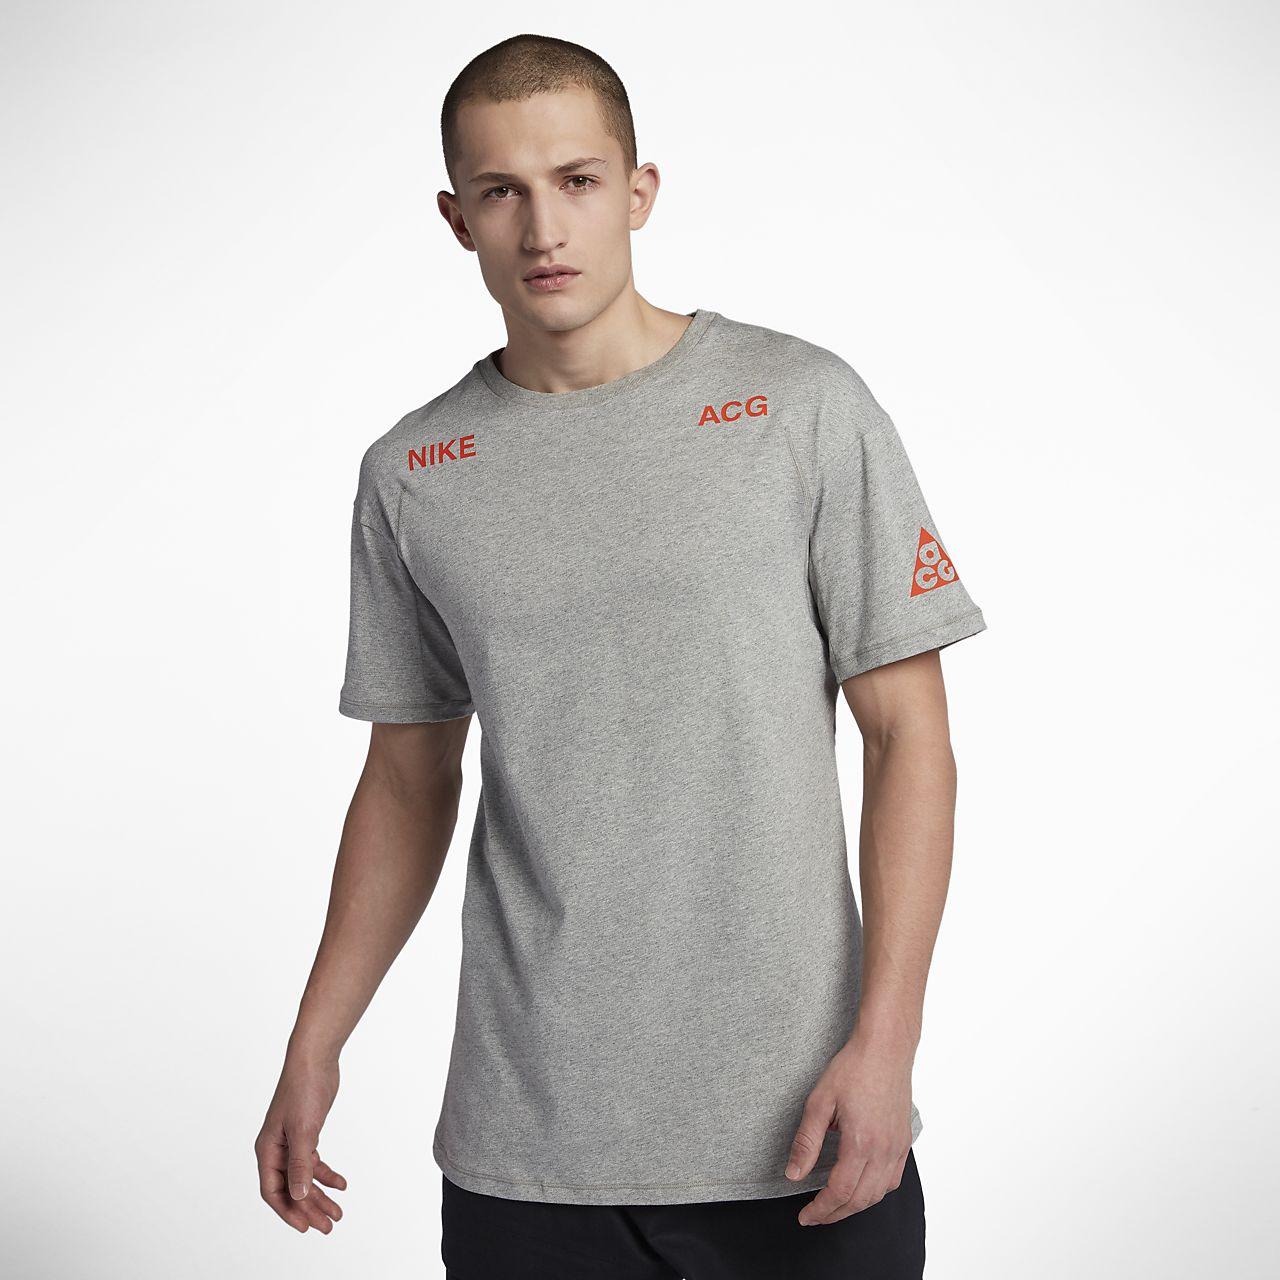 Vn Nikelab Acg Shirt Men's T q8qnUwvp